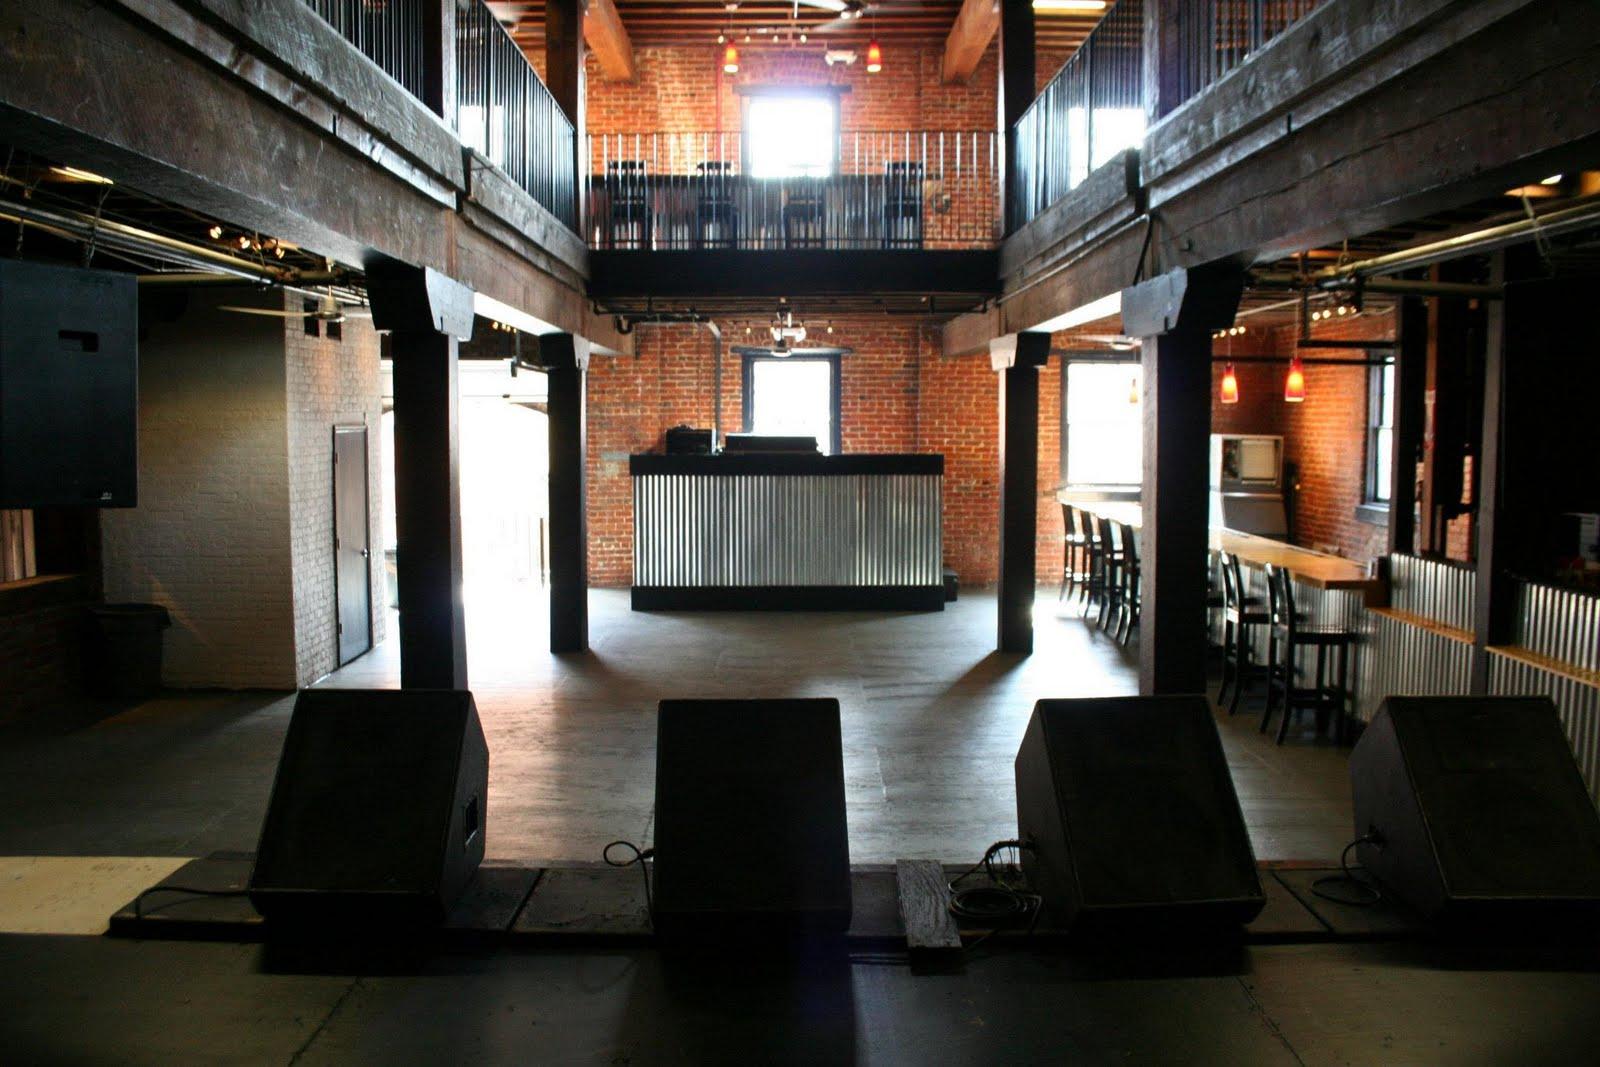 Alley Katz Richmond Closed